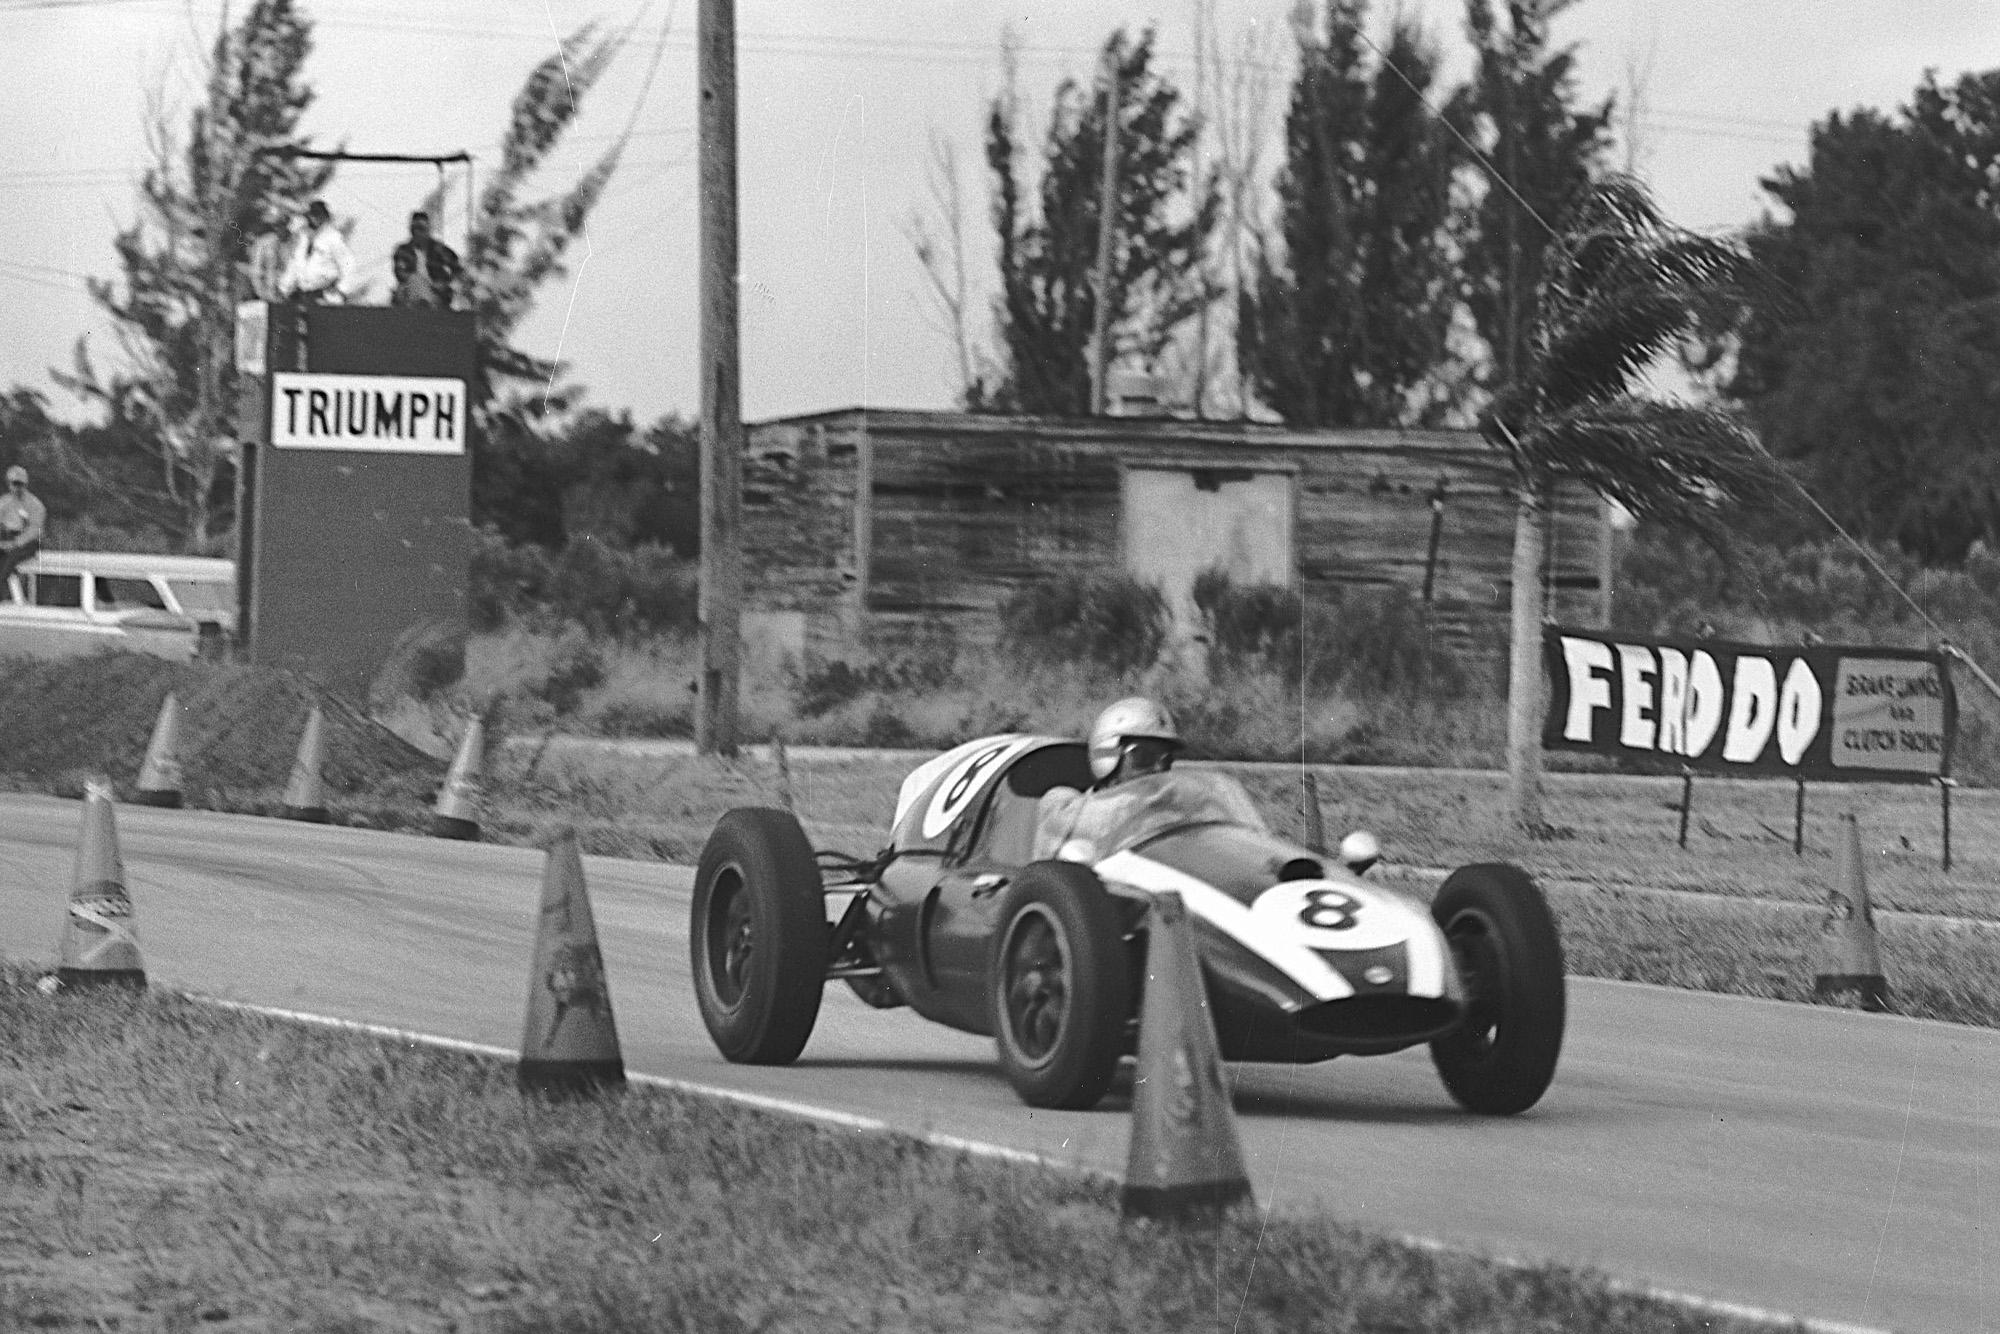 Jack Brabham in the 1959 united States Grand Prix at Sebring